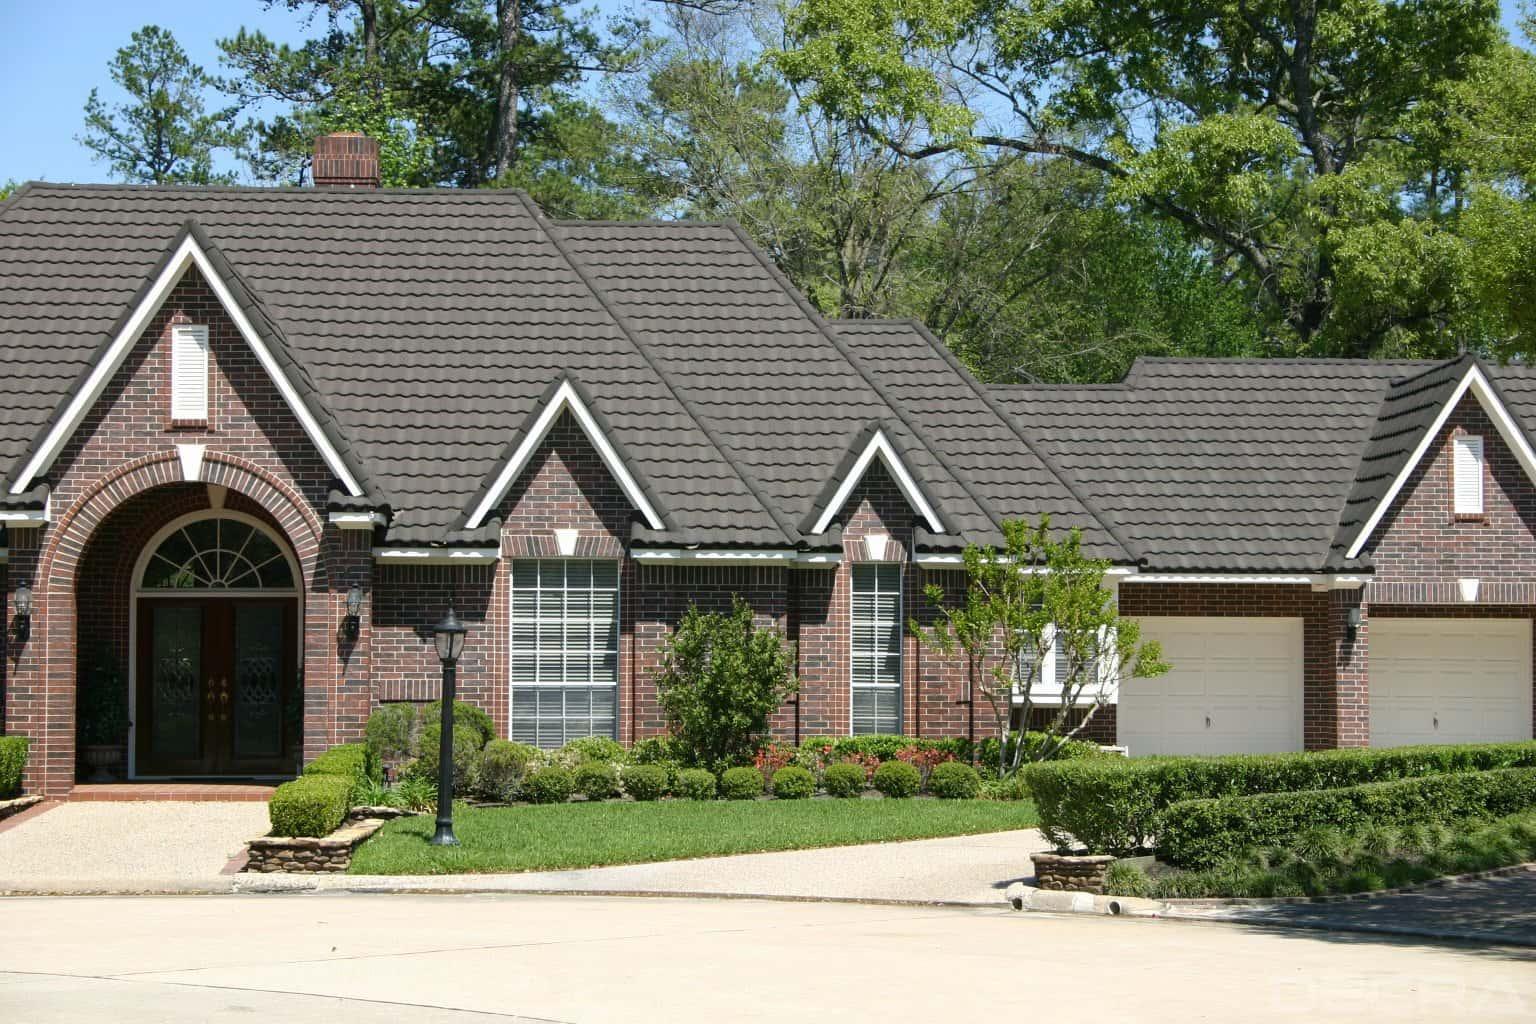 DECRA Tile Weathered Timber House